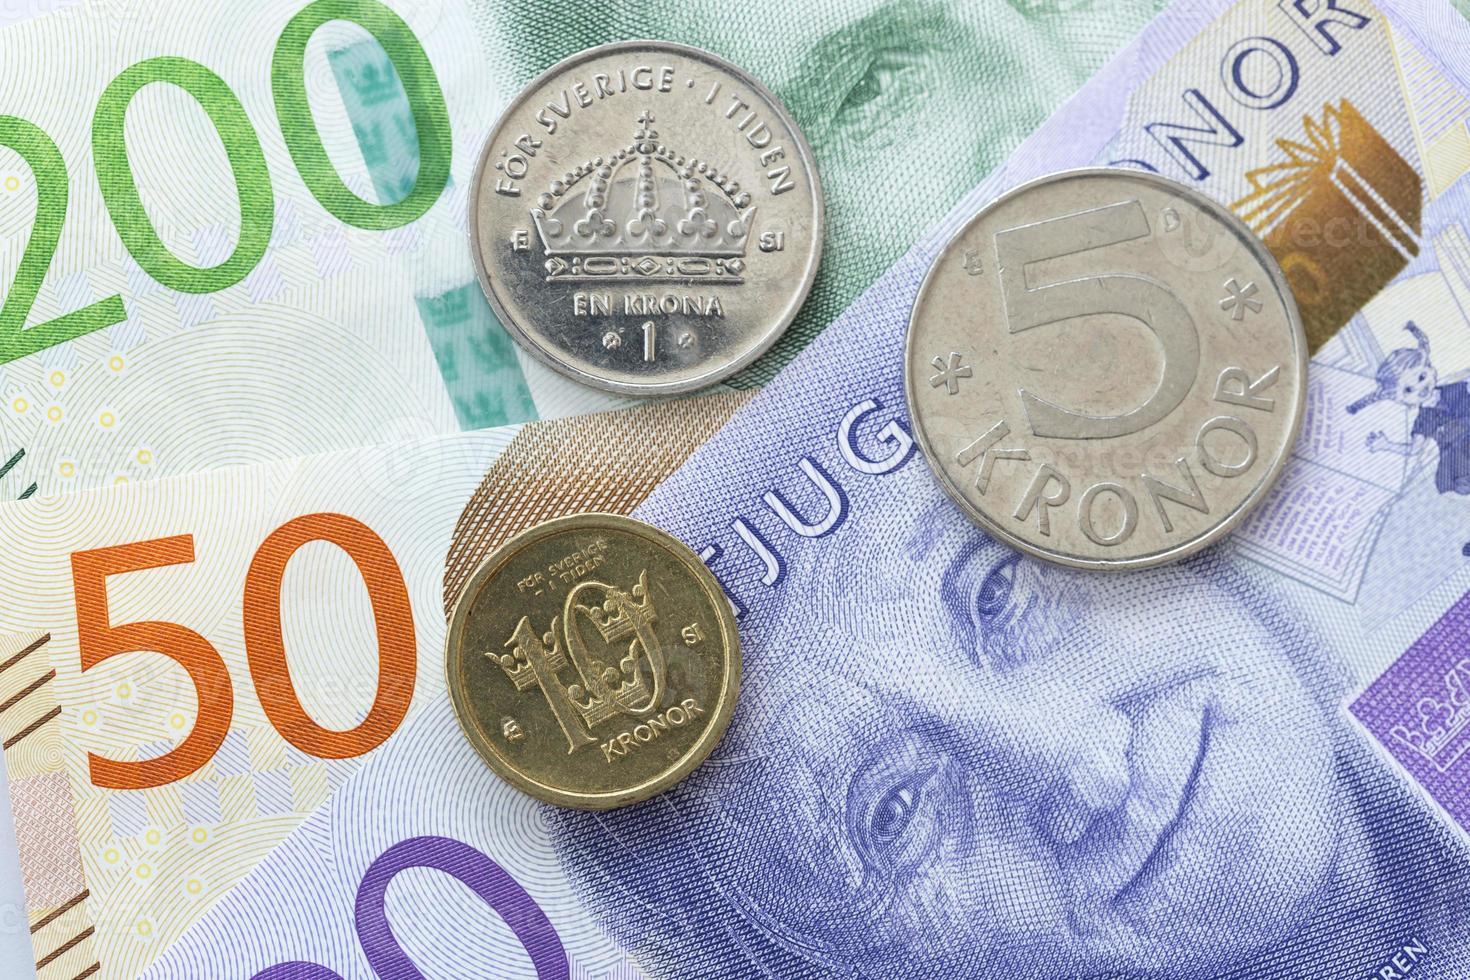 moeda sueca close-up foto